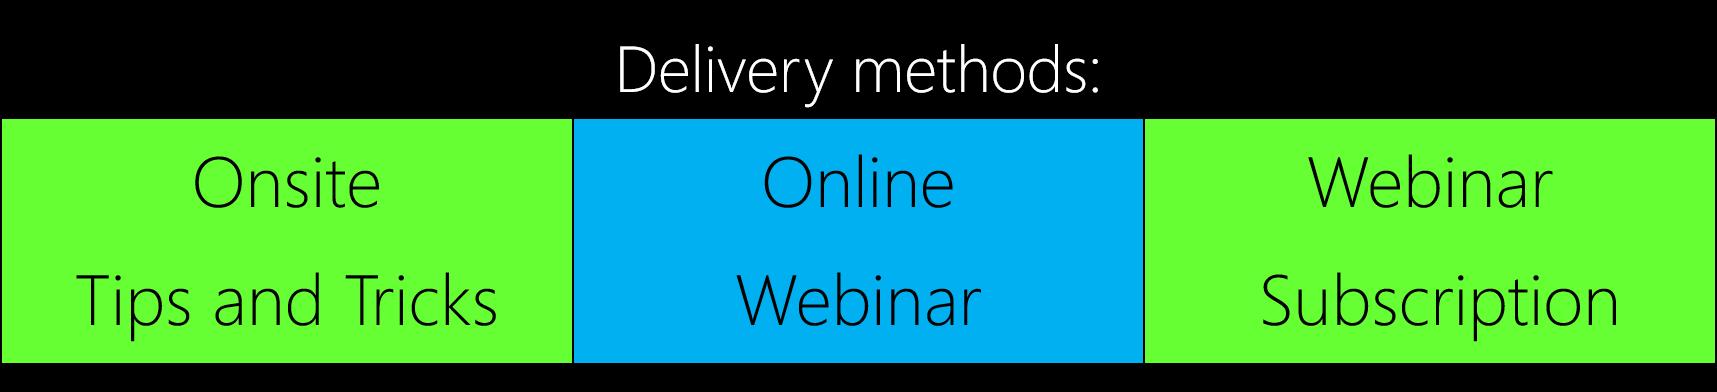 delivery methods - onsite tips and tricks - online webinar - webinar subscription - series